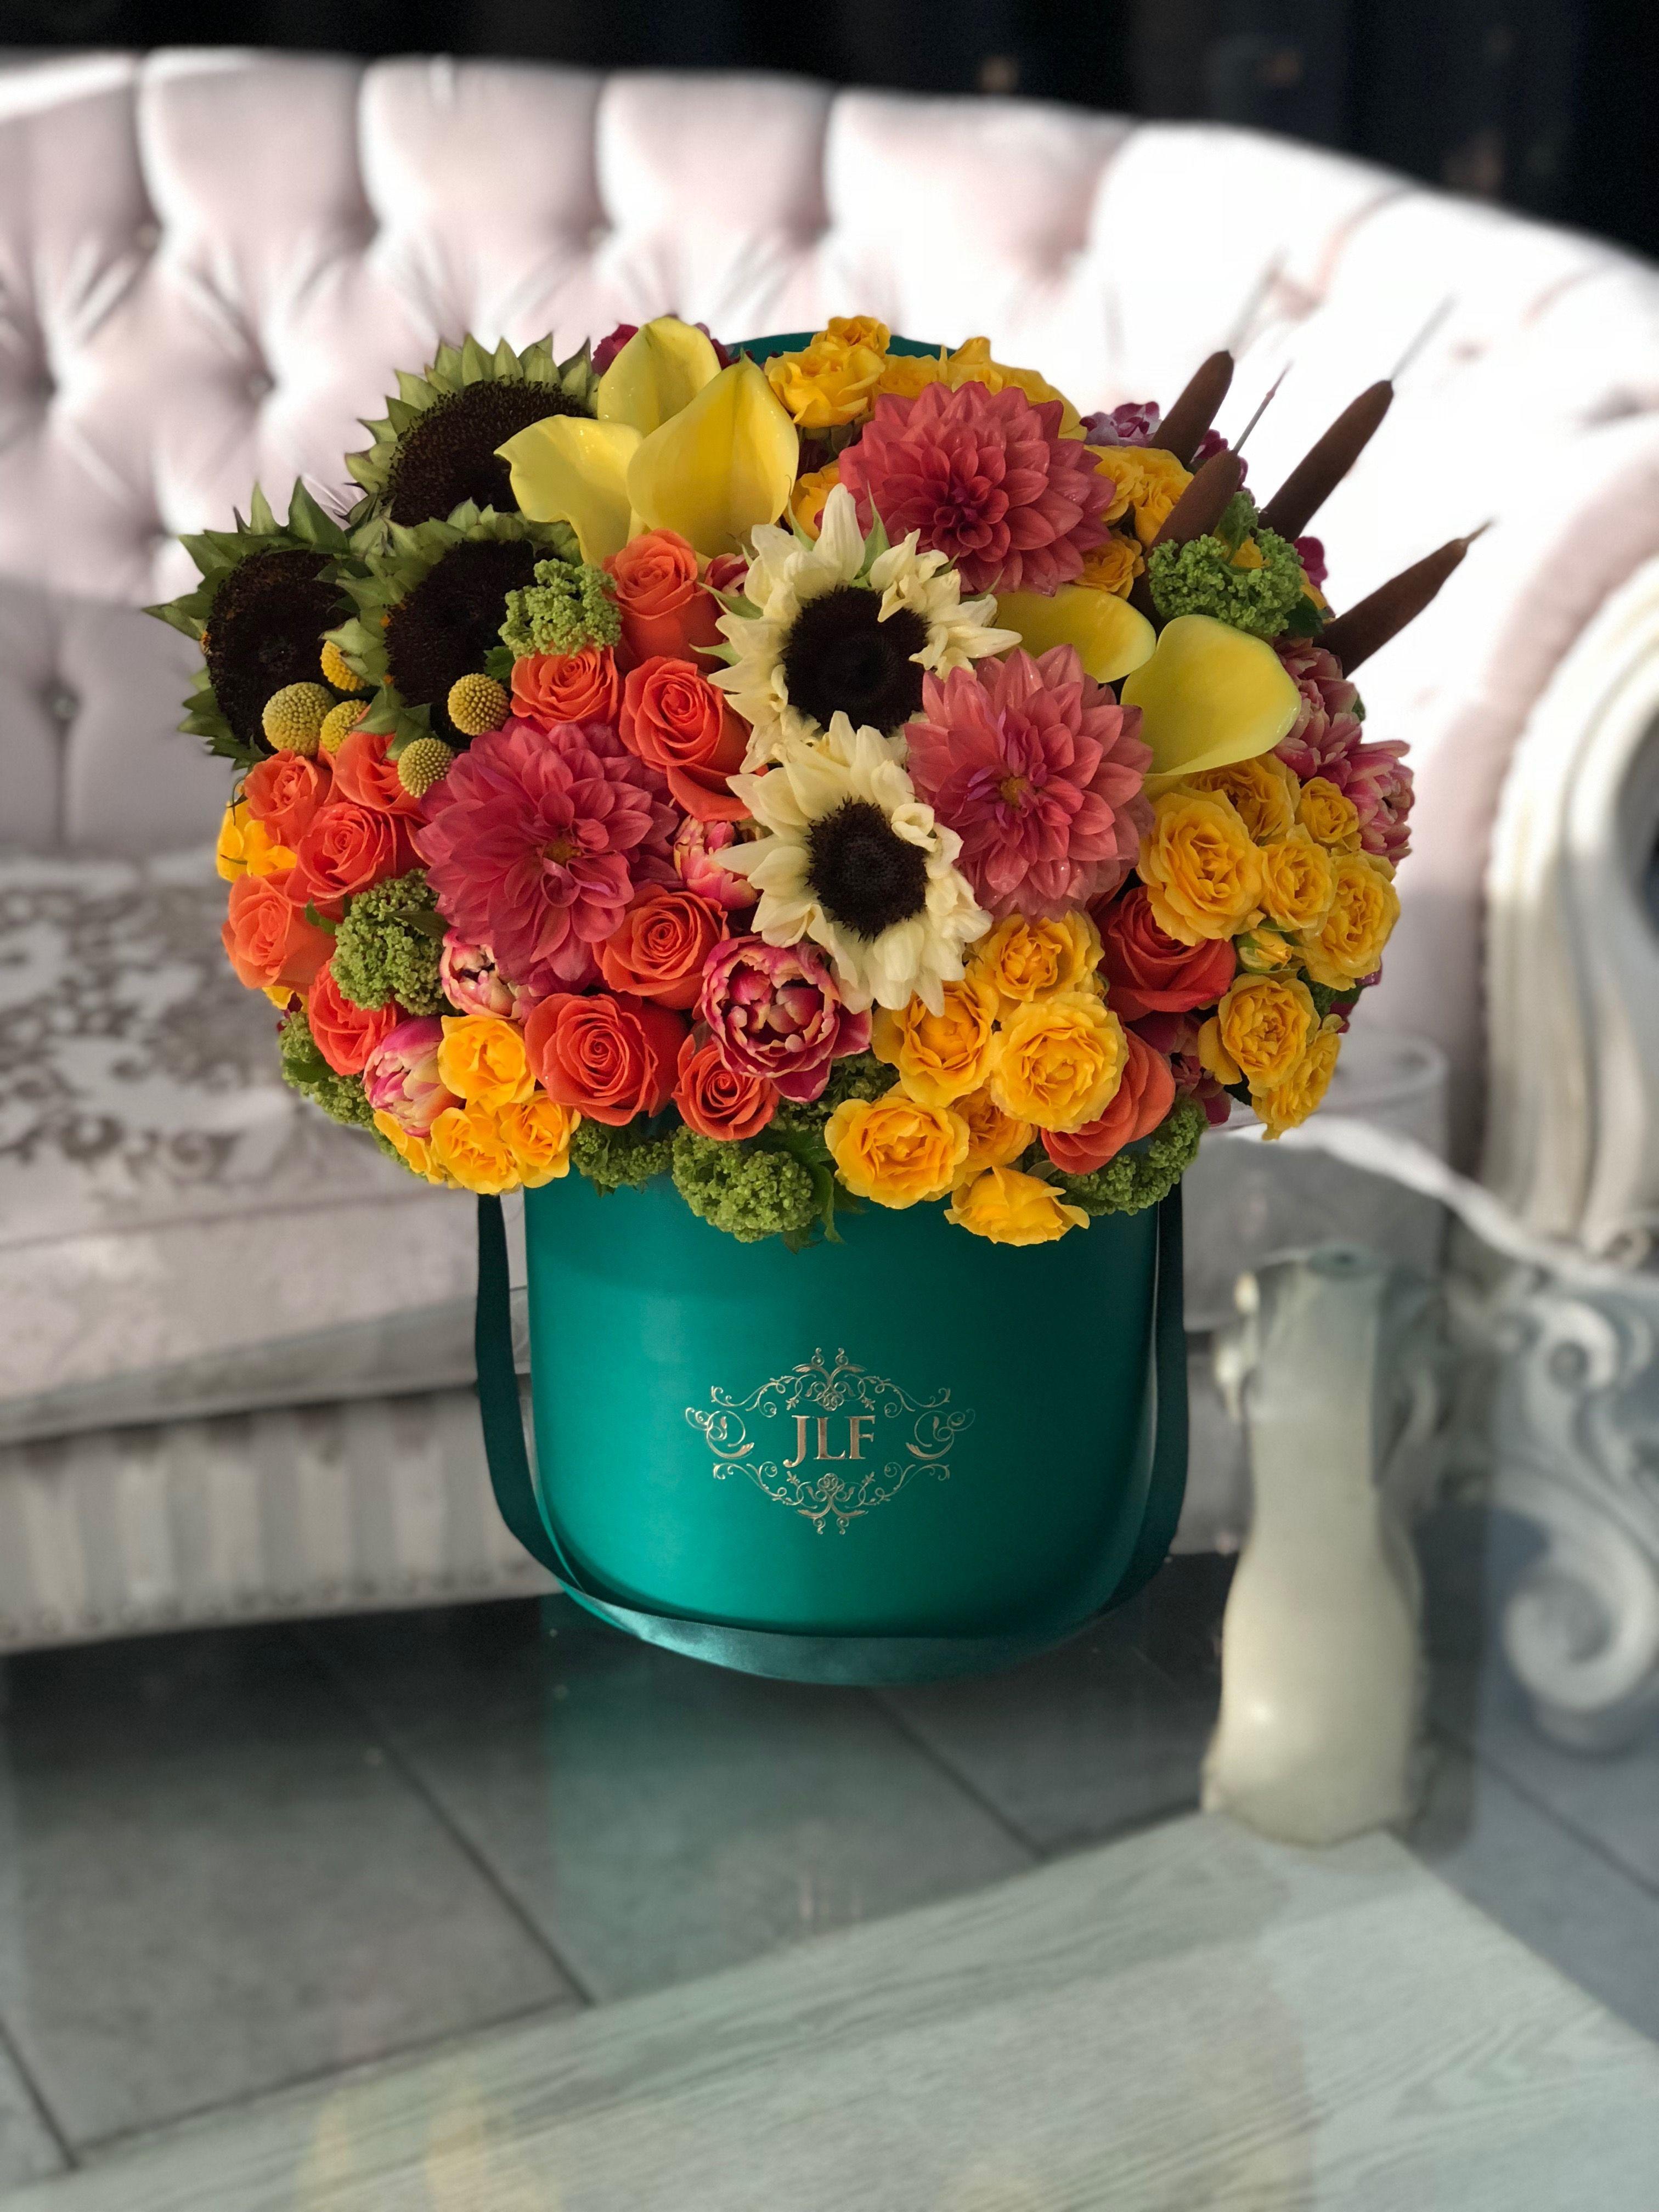 Jlf Flowers Fall Sunflowers Callalily Orangeroses Same Day Flower Delivery Flower Delivery Order Flowers Online